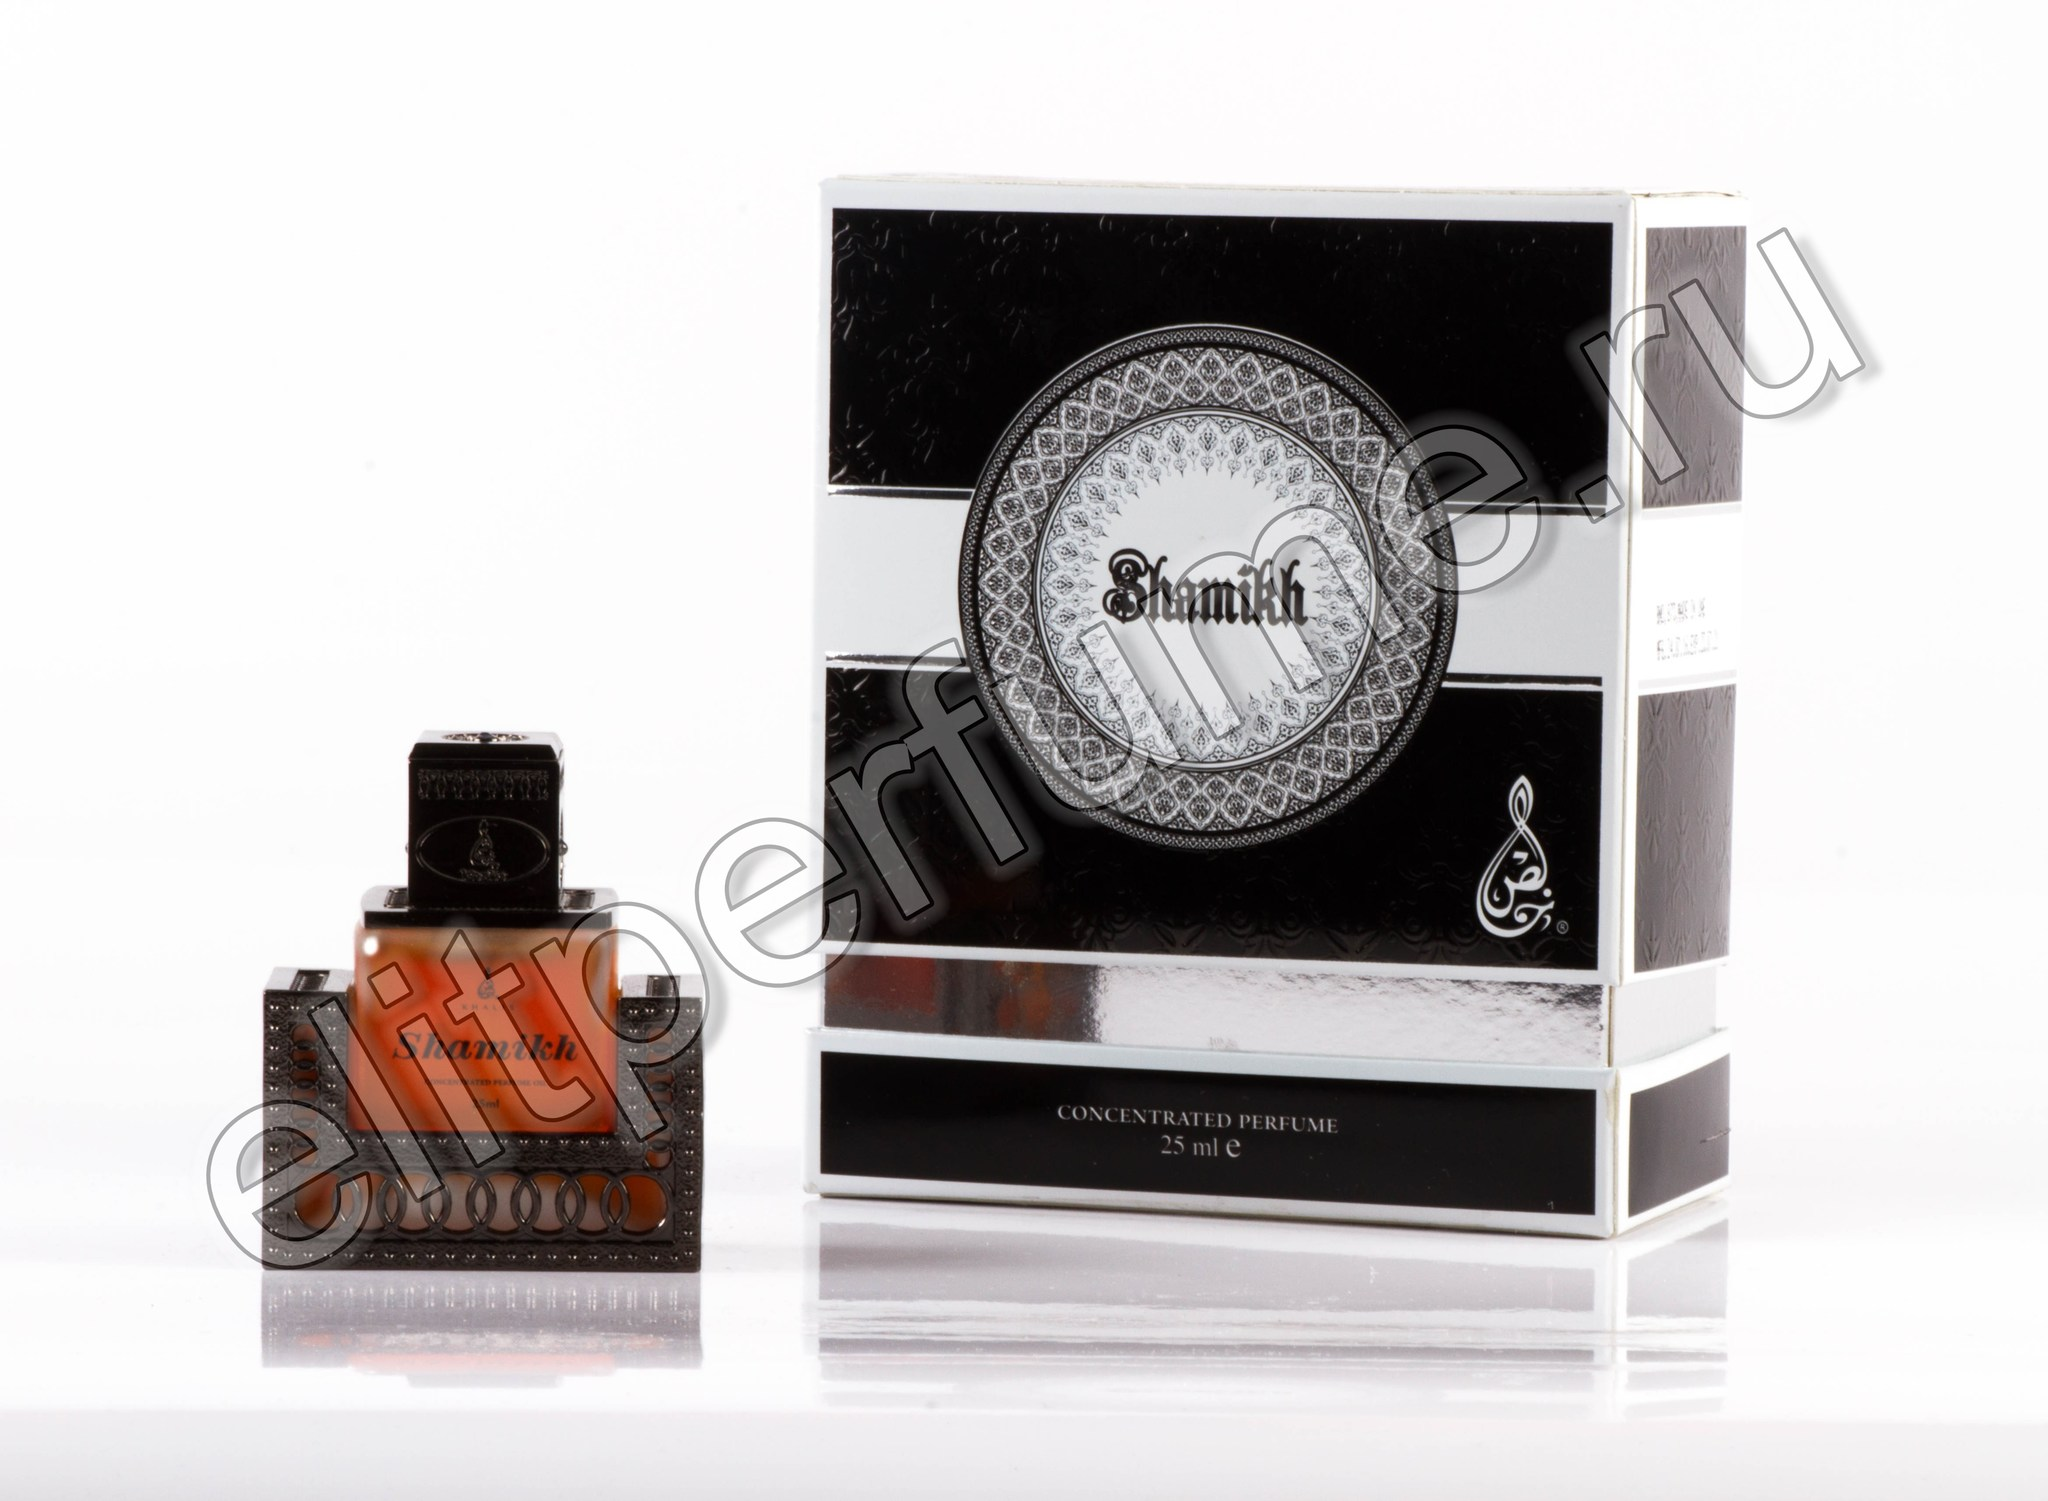 Shamikh Шамих 25 мл арабские масляные духи от Халис Khalis Perfumes